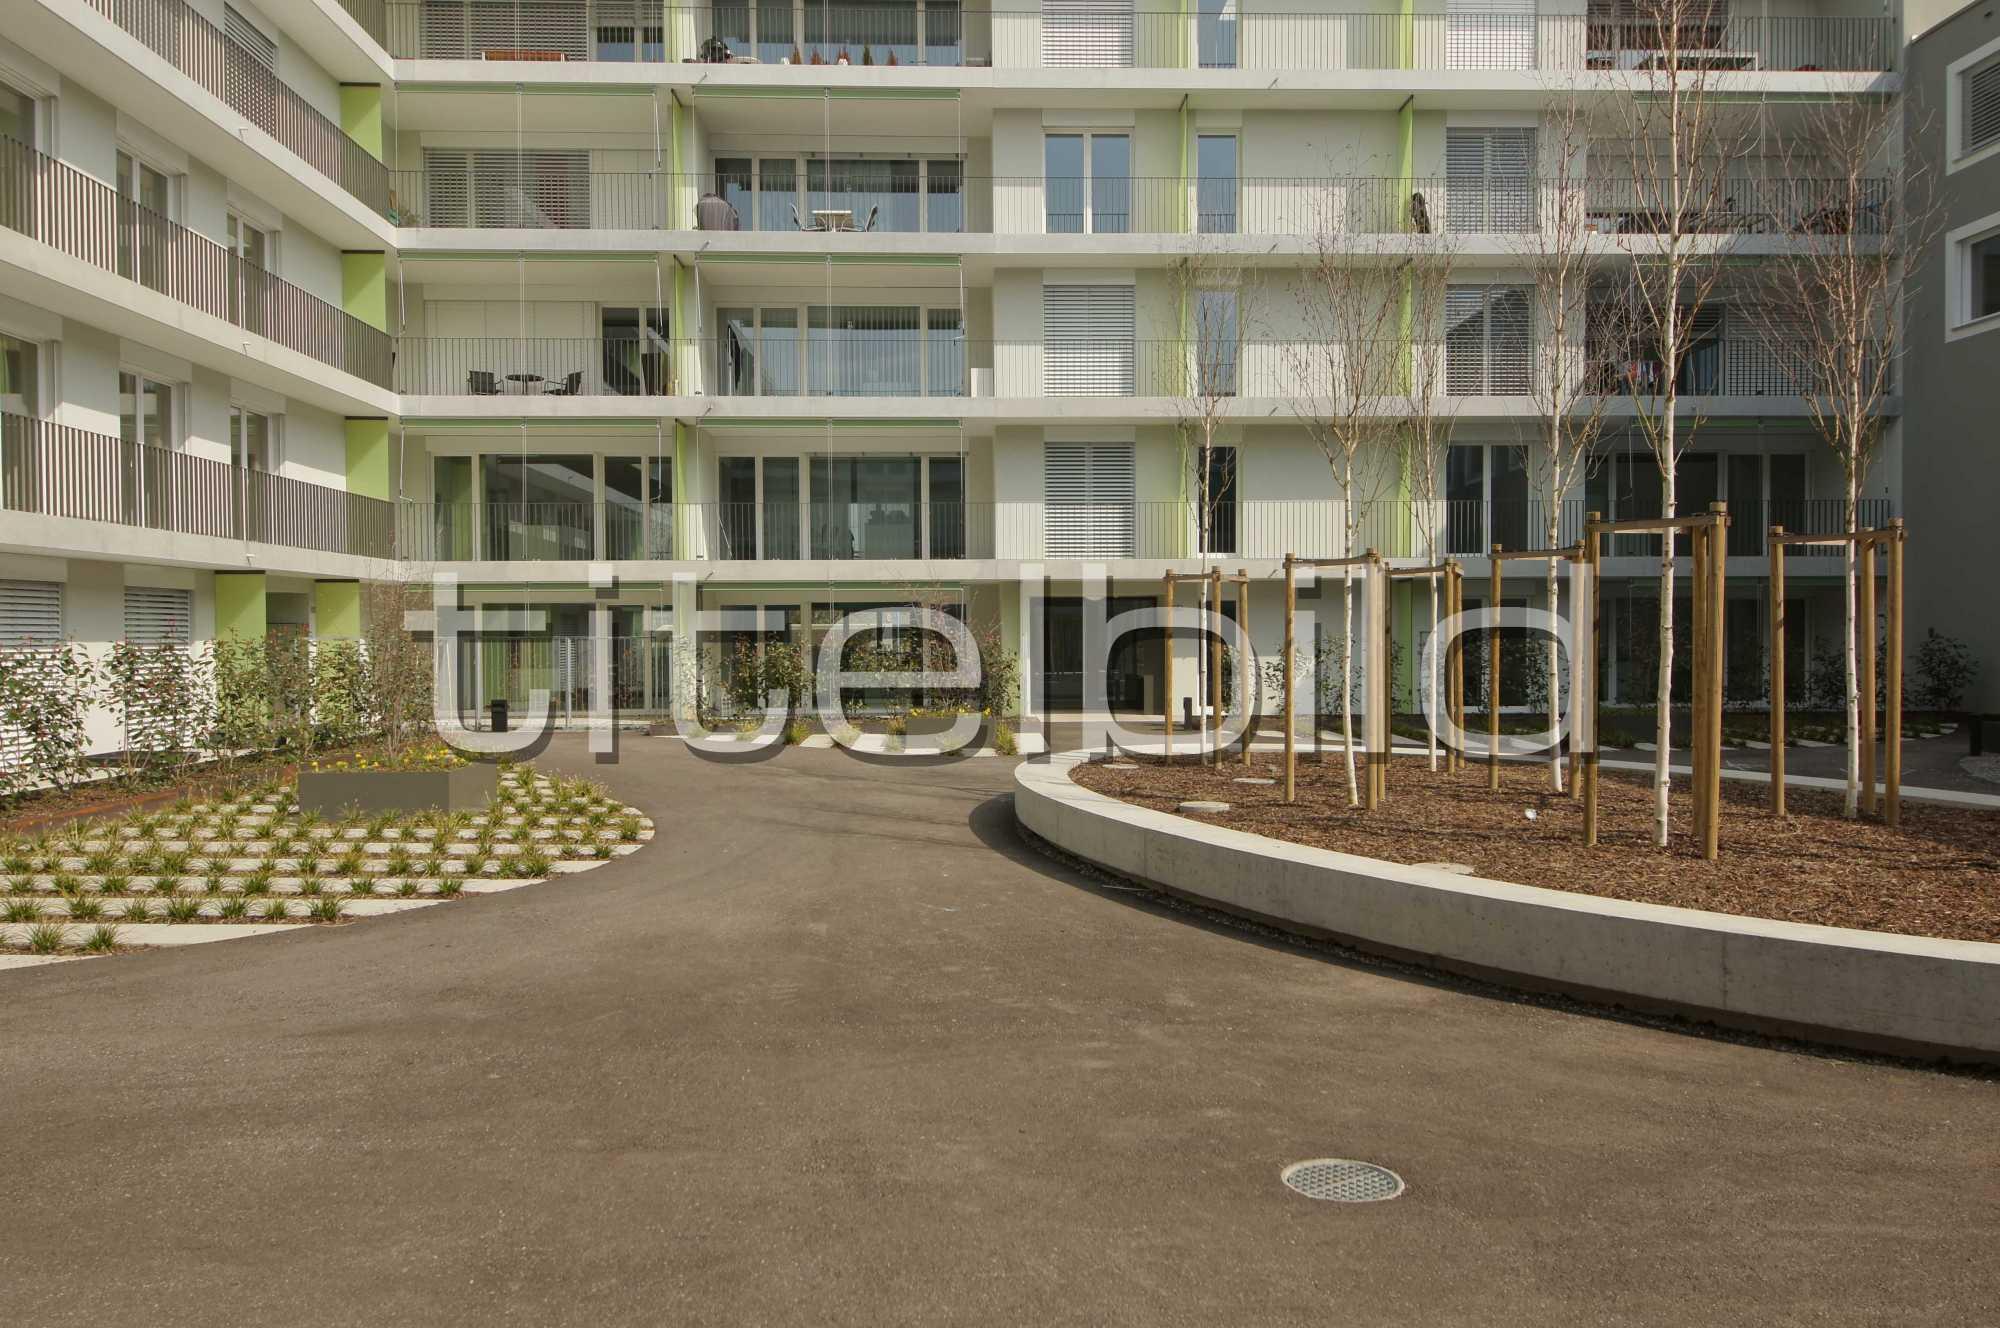 Projektbild-Nr. 4: Breitenpark